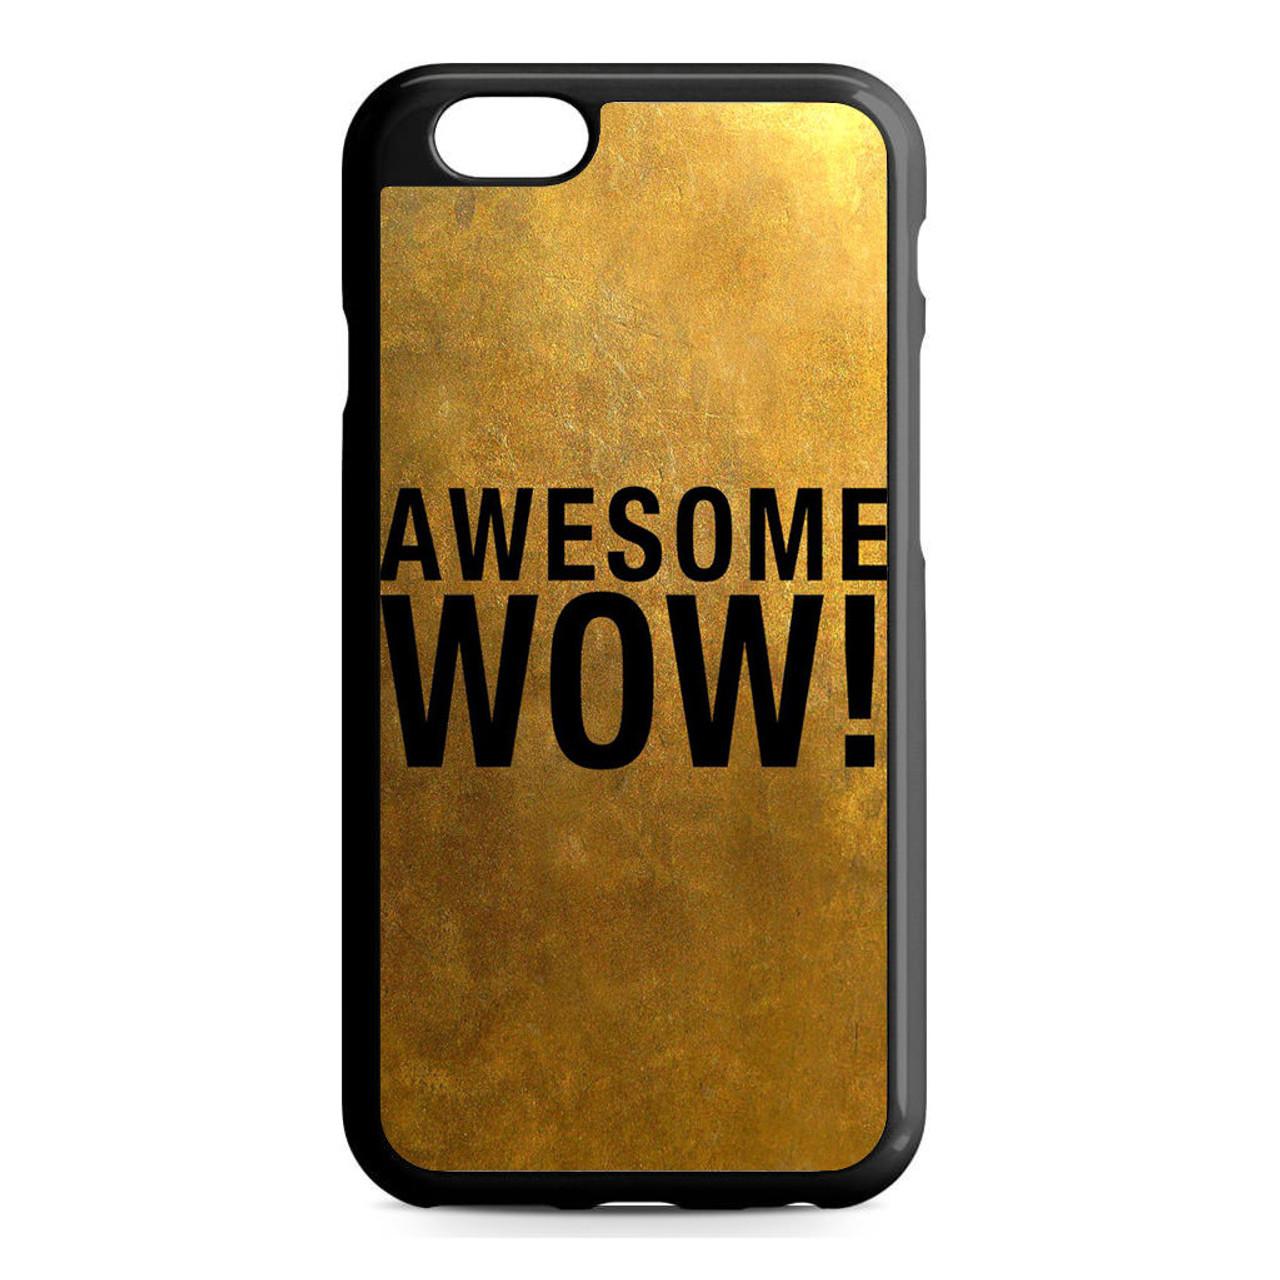 tan iphone 6s case